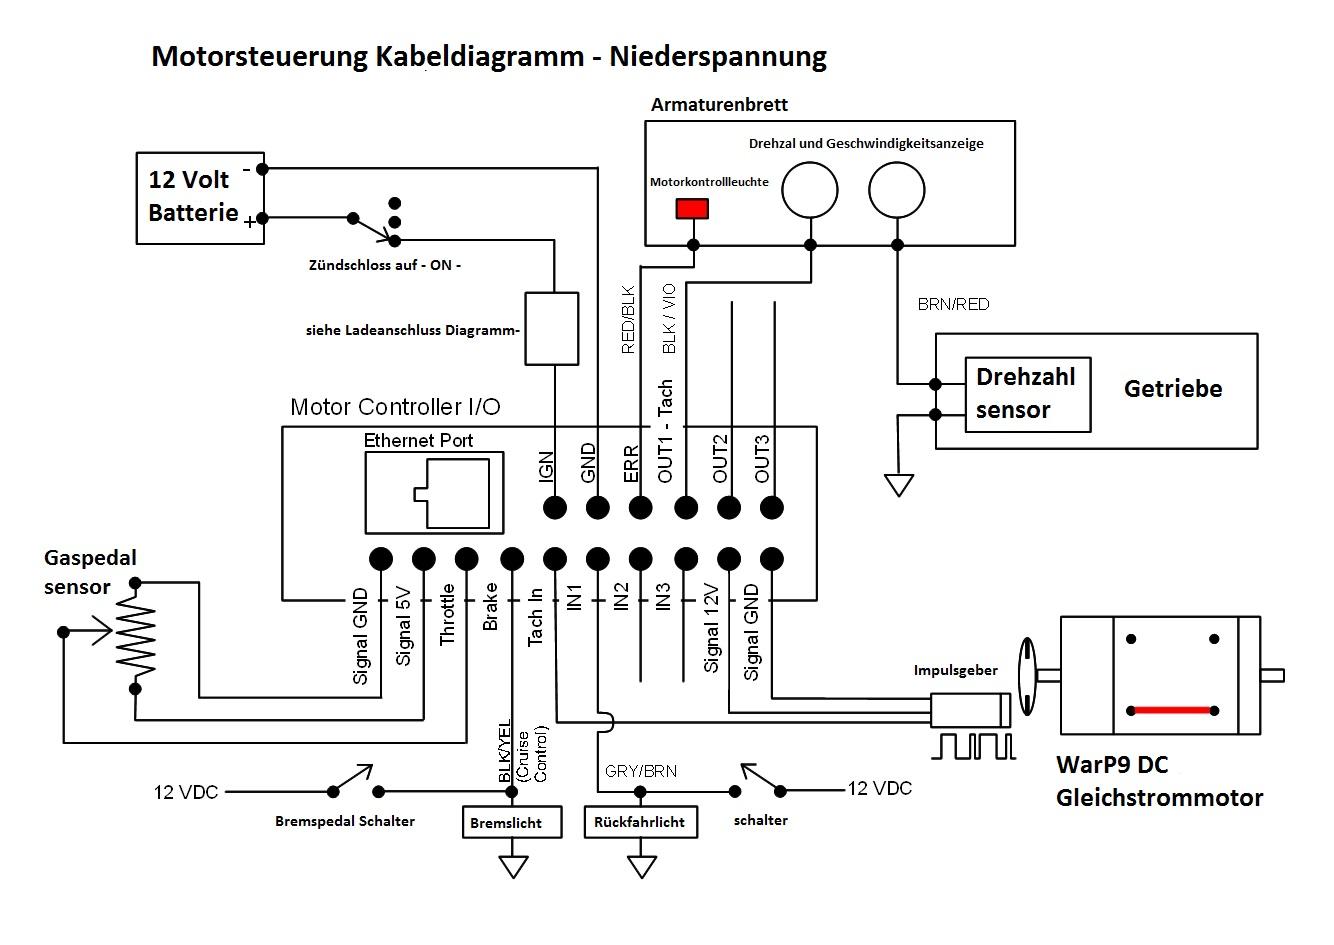 Großzügig Jahrhundert Elektromotoren Schaltplan Fotos - Der ...